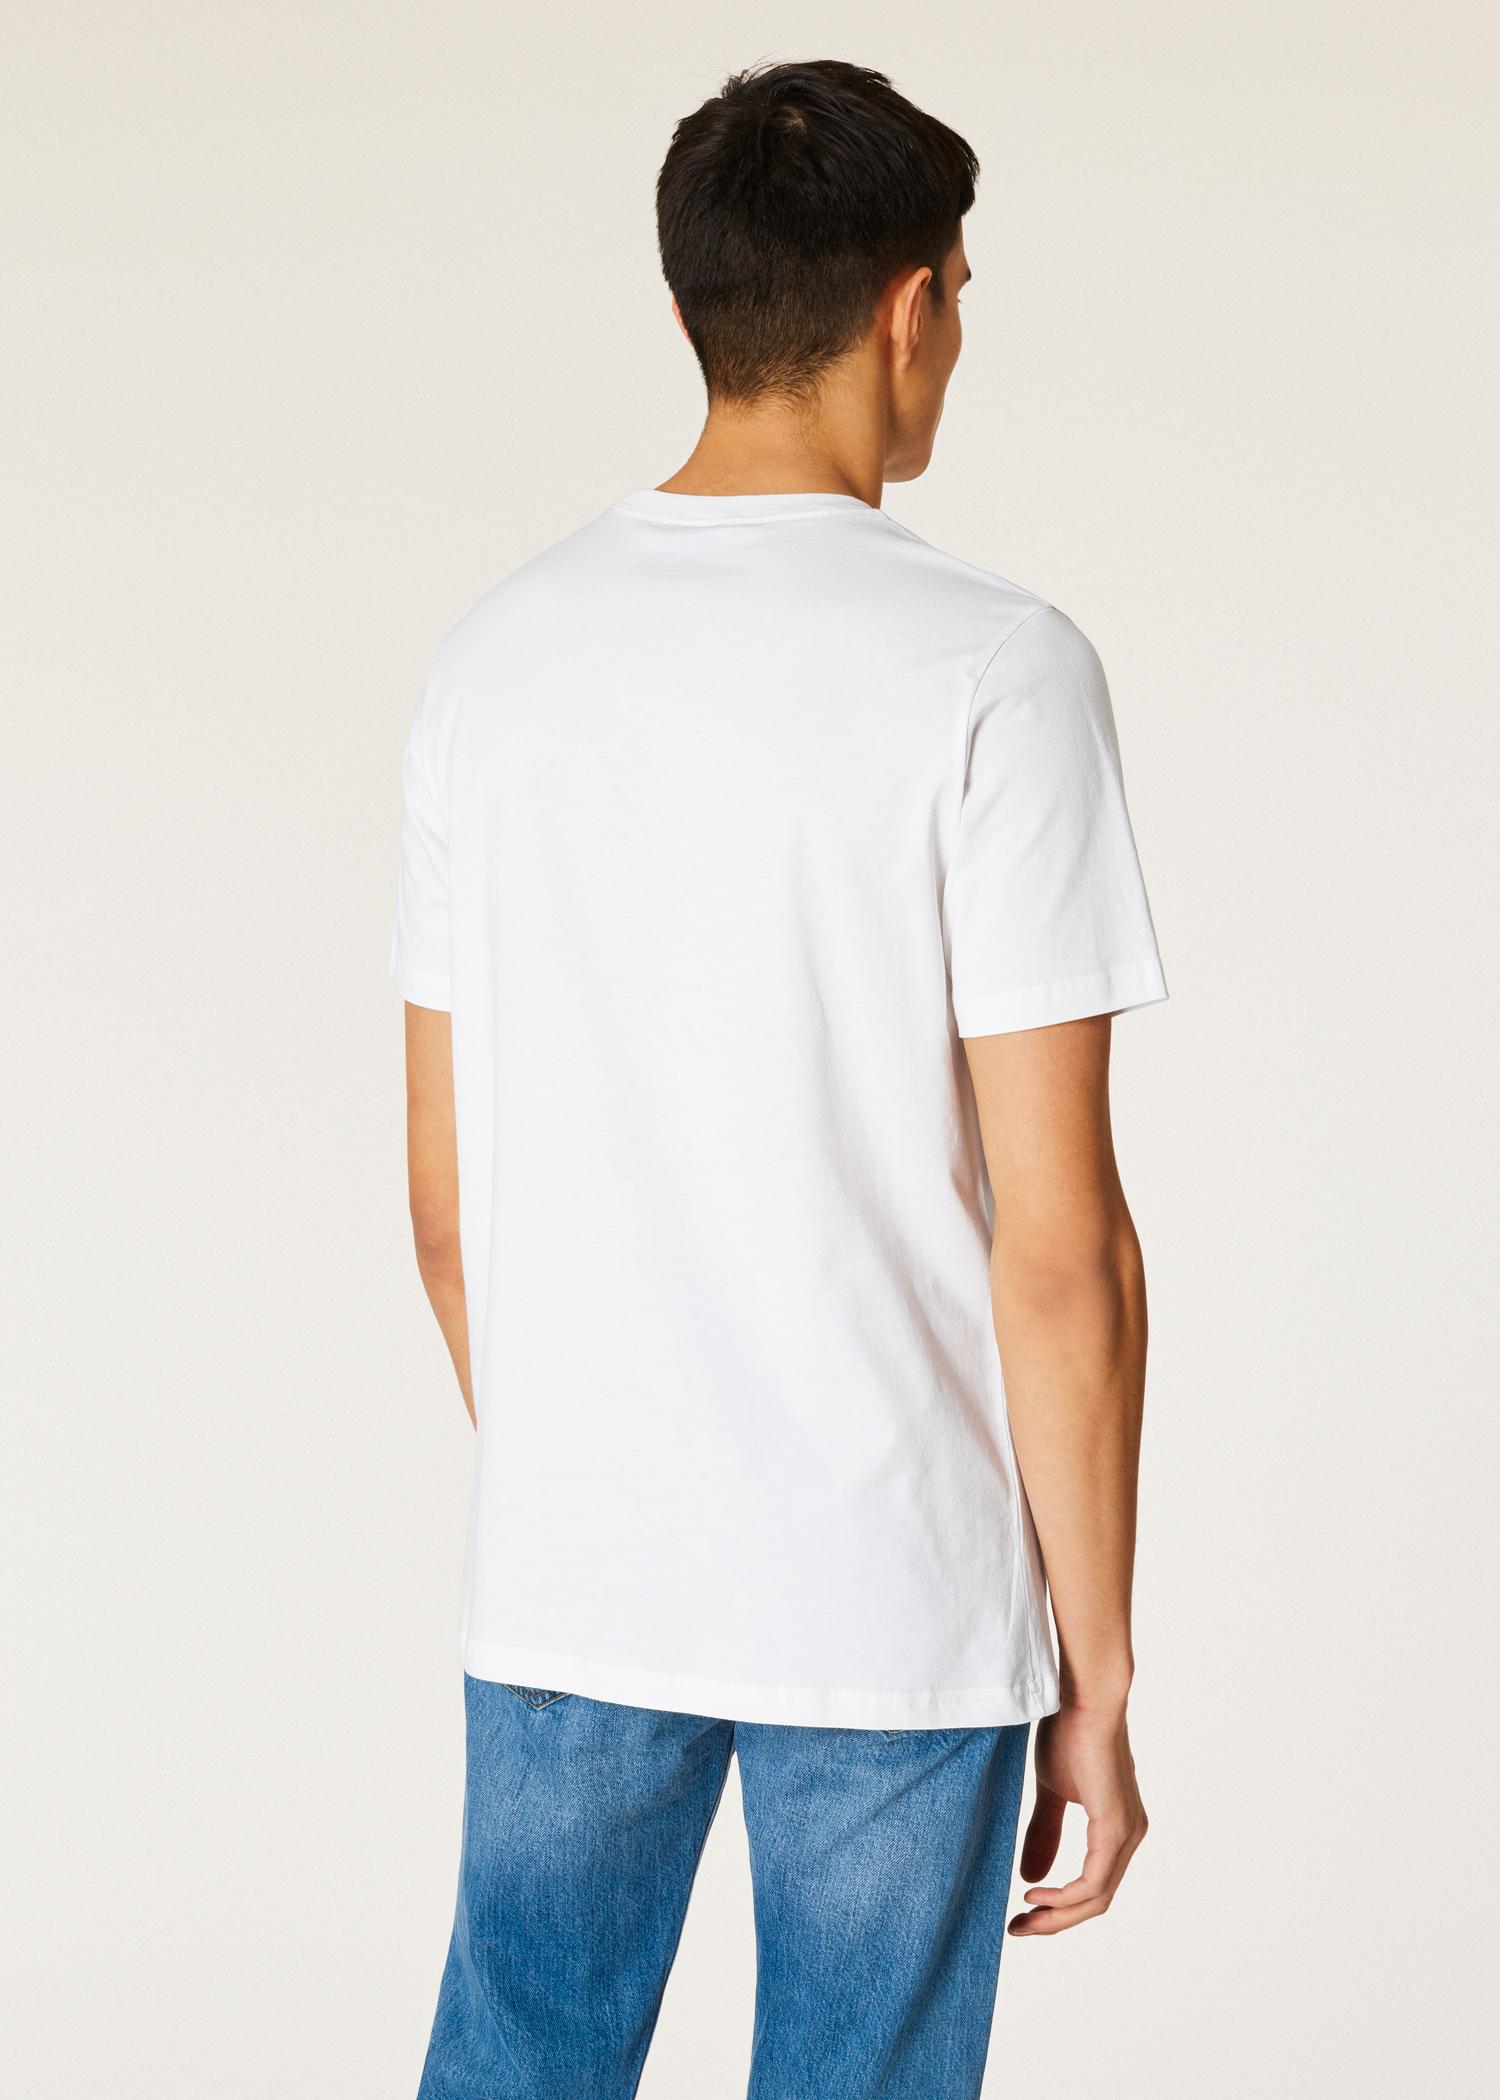 3556b4c481b3a Men s White Large Turquoise  Dino  Print Cotton T-Shirt - Paul Smith ...